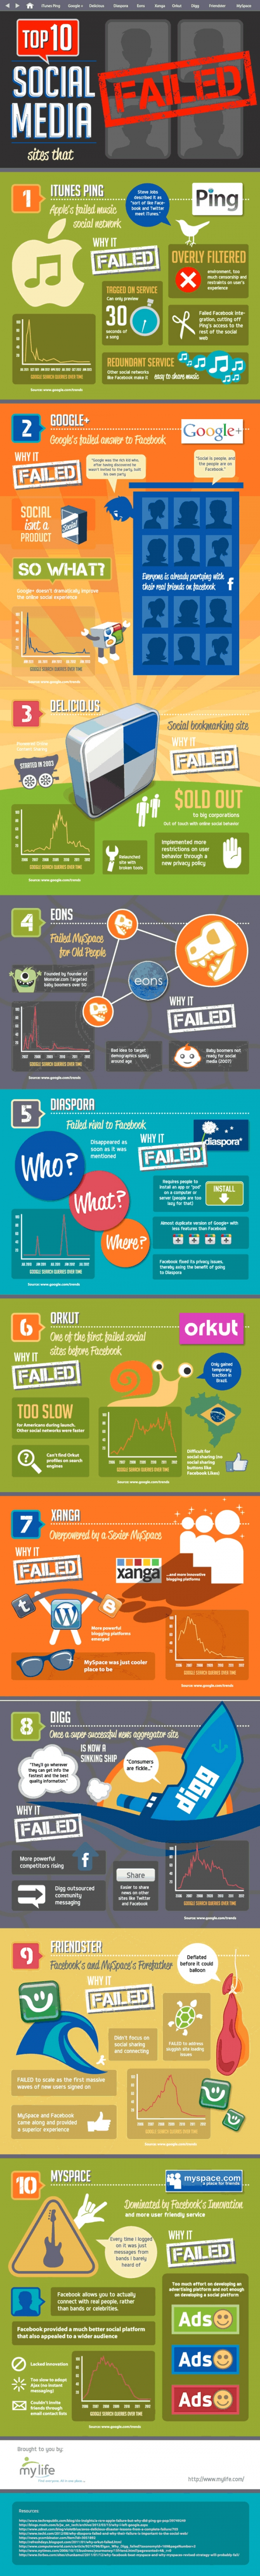 Infografik Vergleich soziale Netzwerke